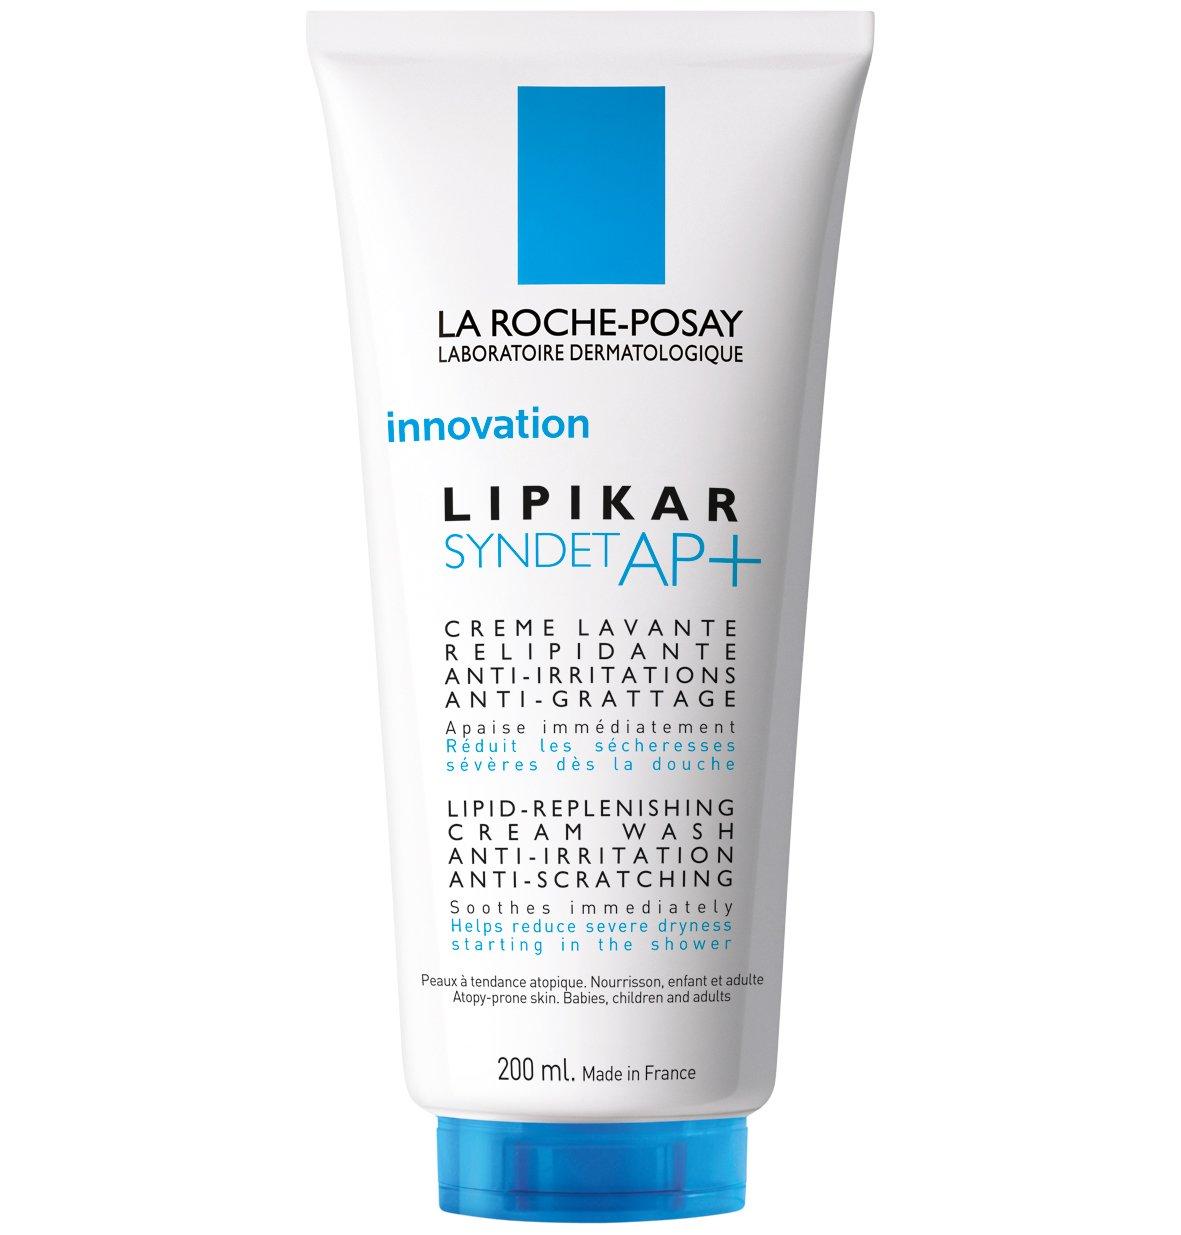 La Roche-Posay Lipikar Syndet AP+ Kρέμα Καθαρισμού για Αναπλήρωση των Λιπιδίων, Κατά των Ερεθισμών & του Κνησμού, Χωρίς Σαπούνι – 400ml